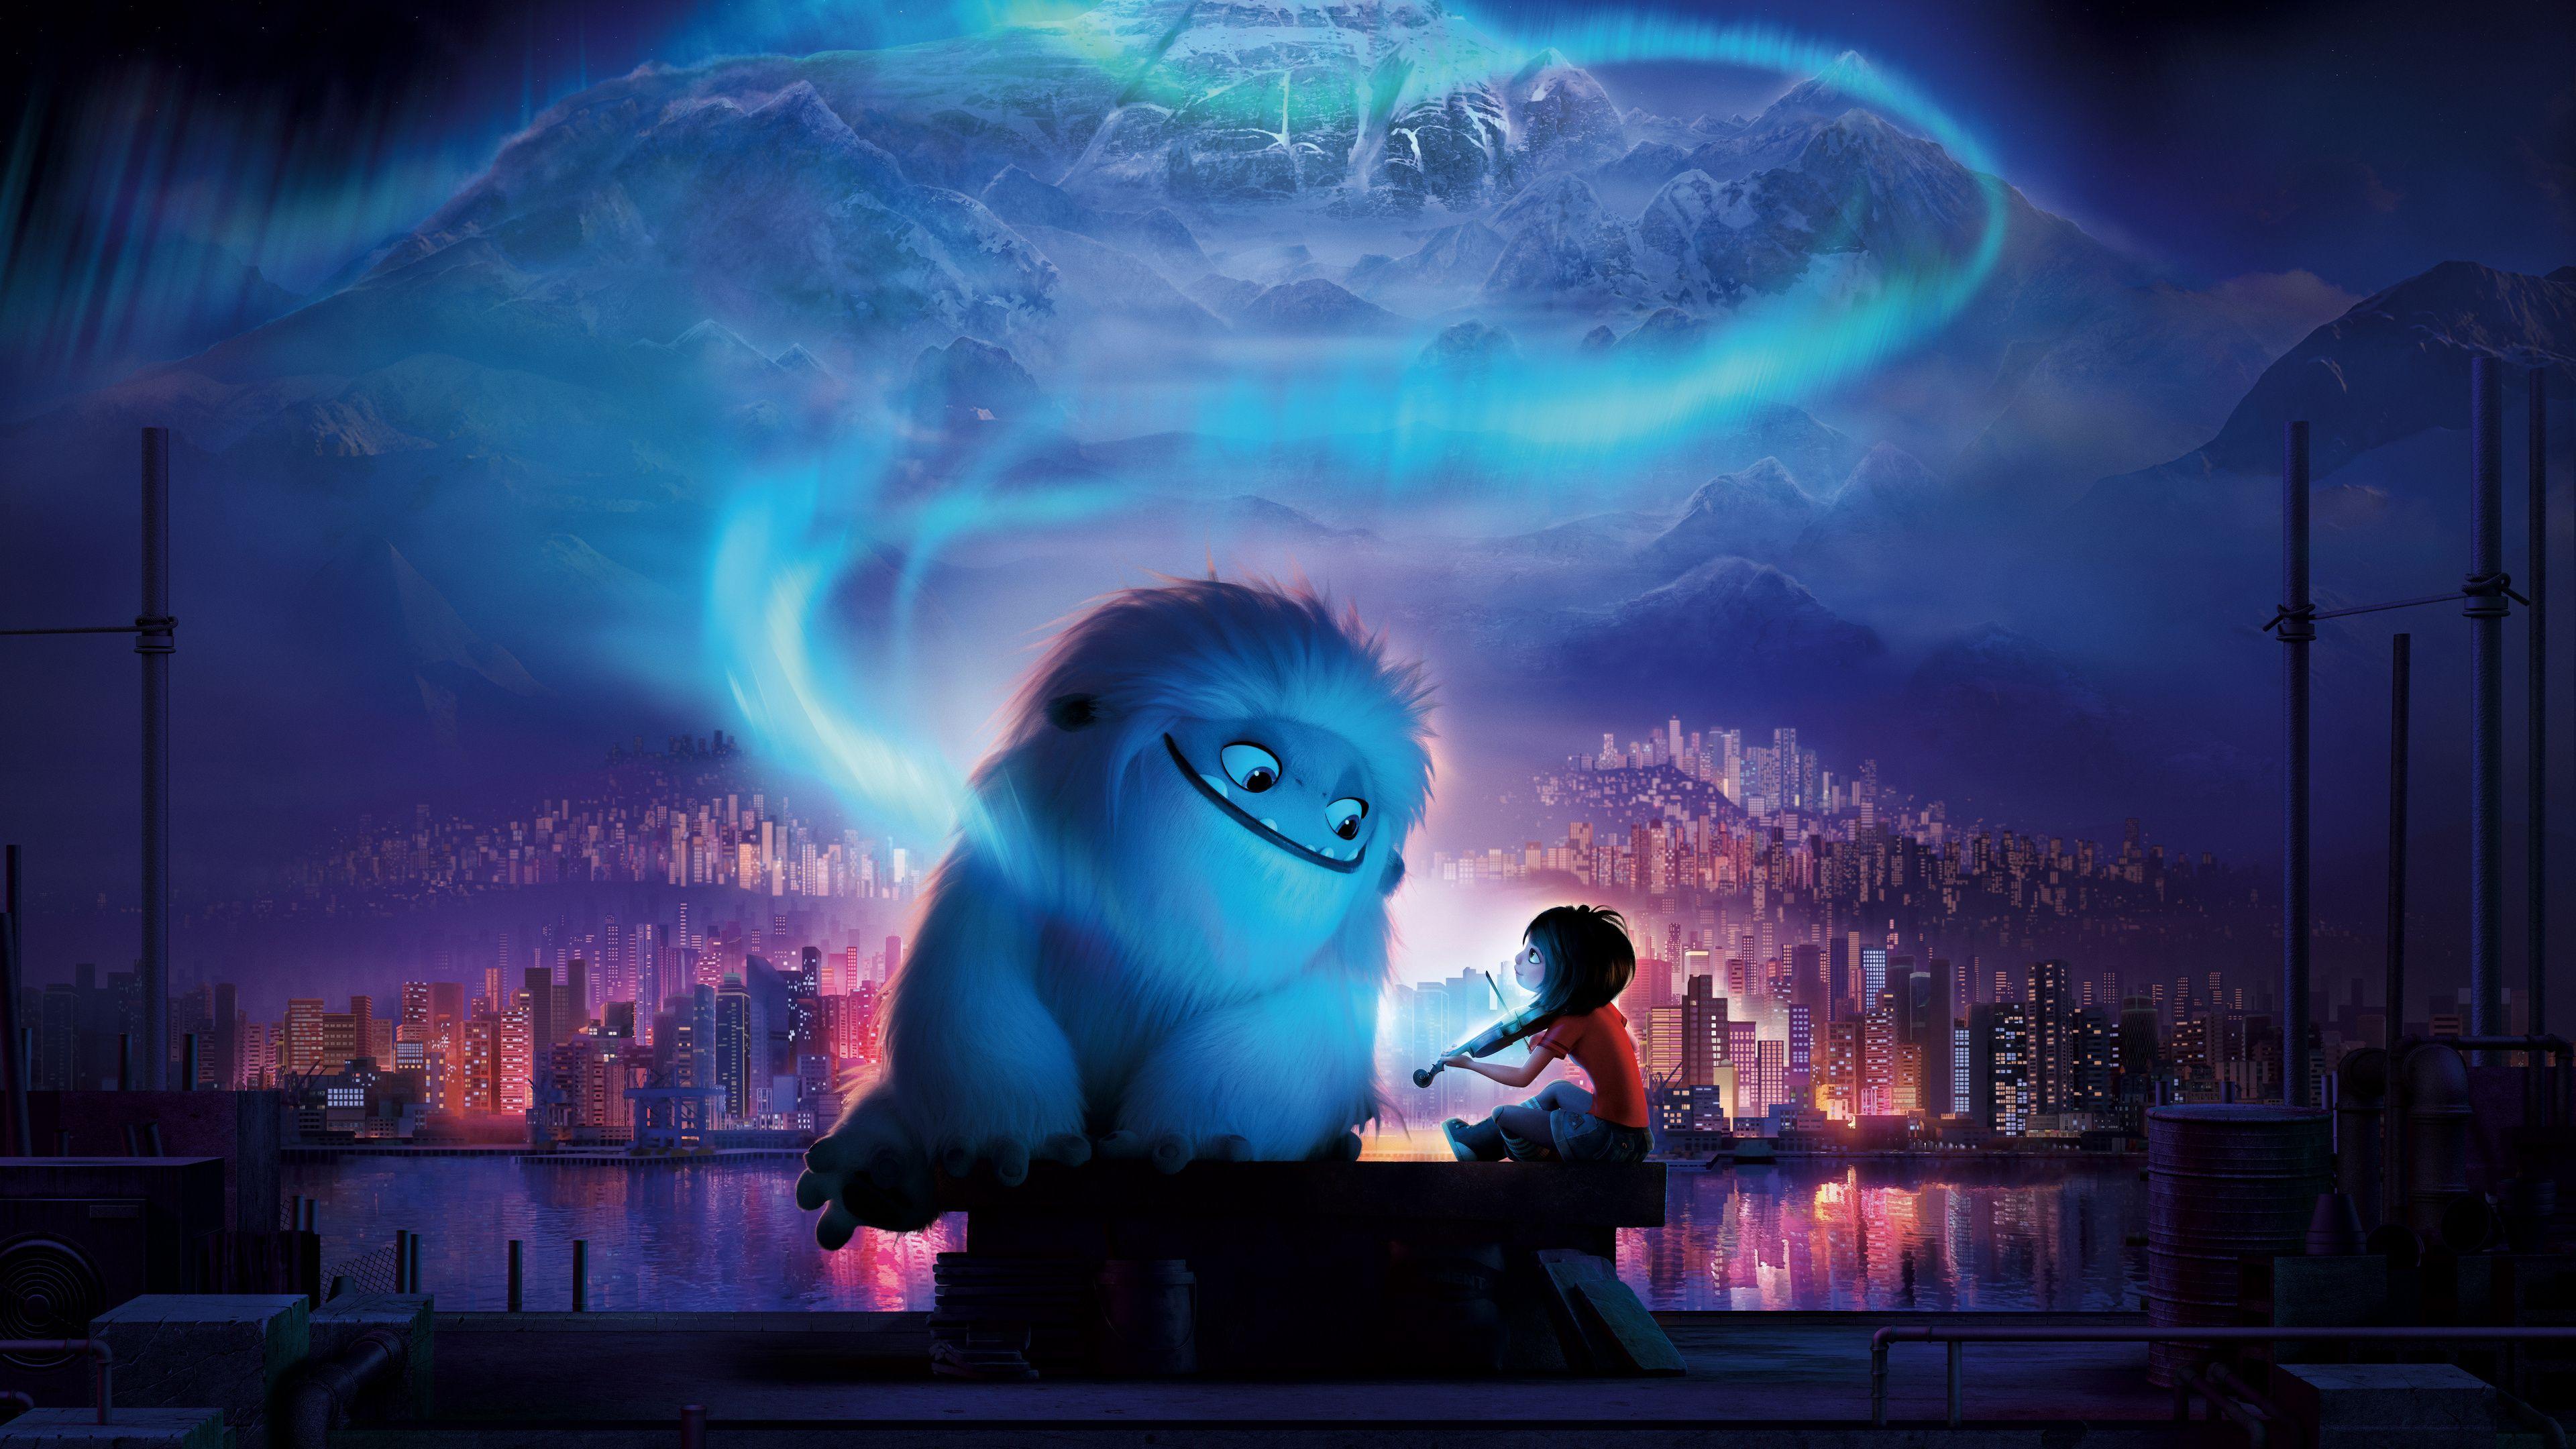 3840x2160 Abominable Animation Movie Yeti And Kid Wallpaper Animation Movie Streaming Movies Streaming Movies Free